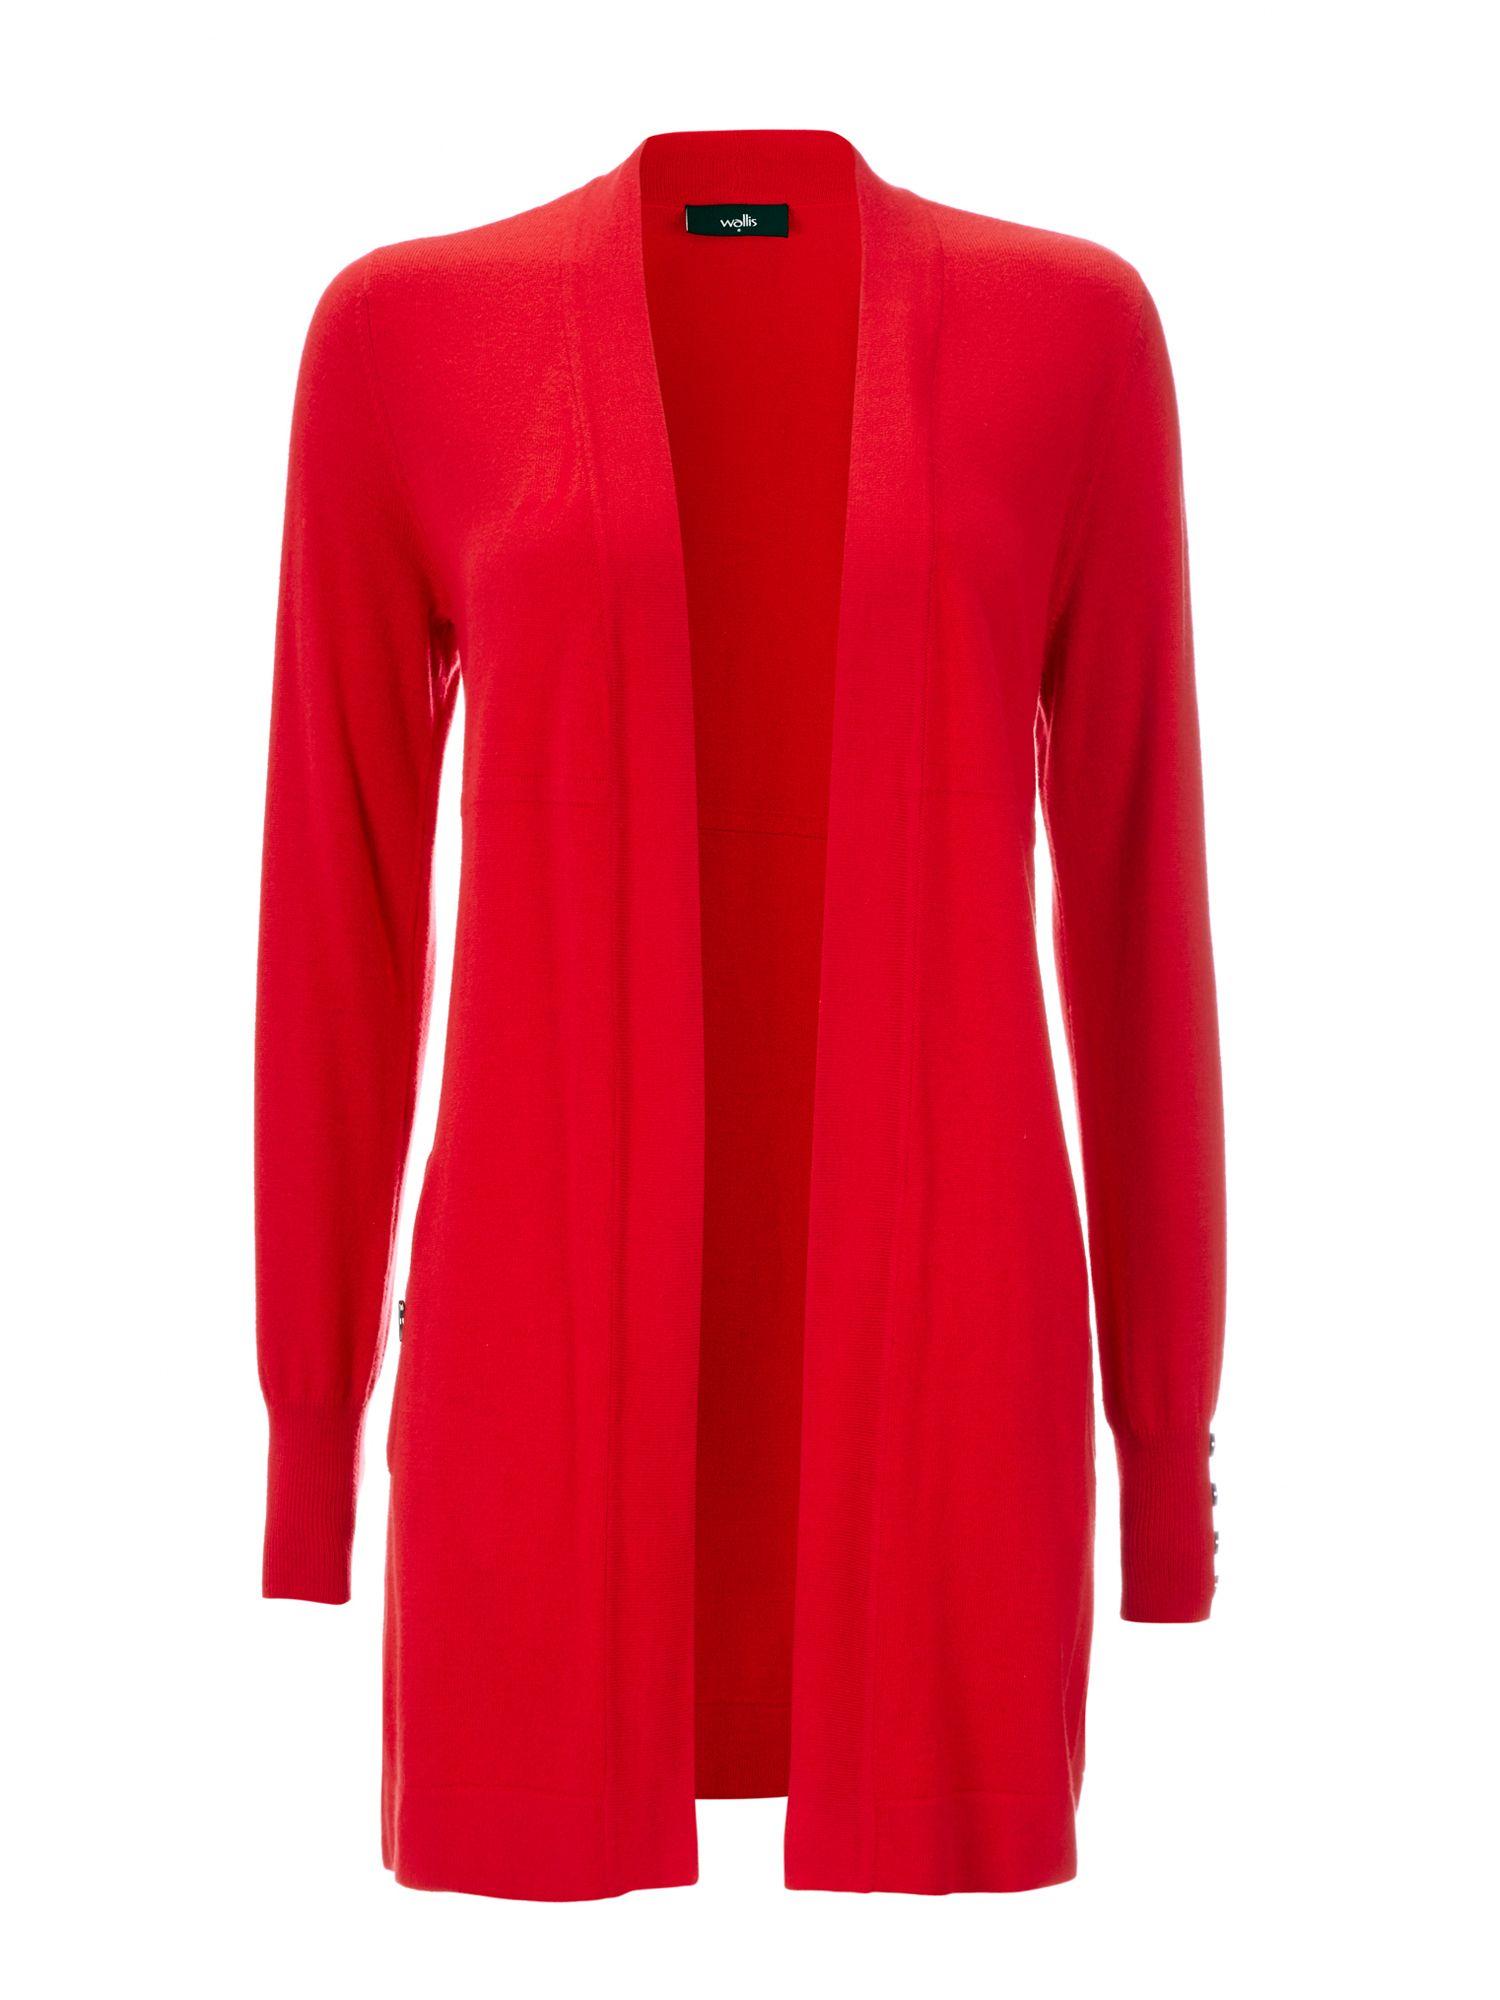 Wallis Button Pocket Cardigan in Red